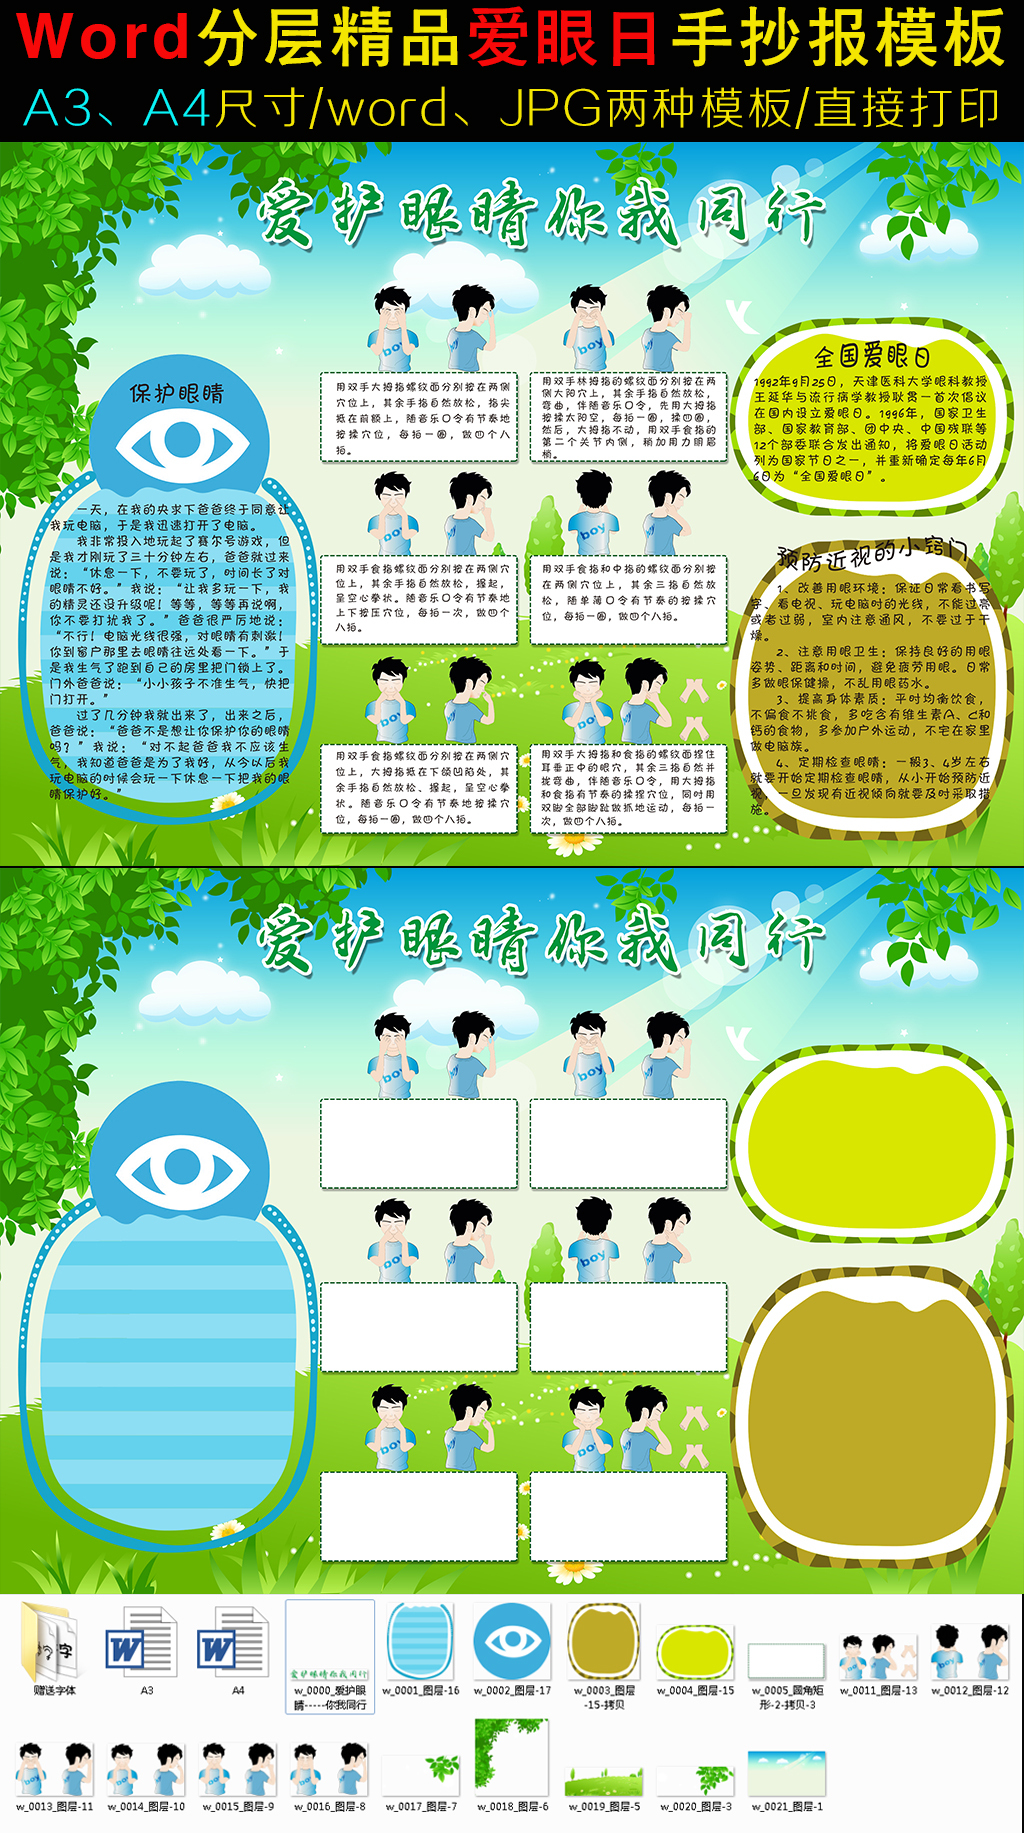 word爱眼日小报保护眼睛视力健康.图片